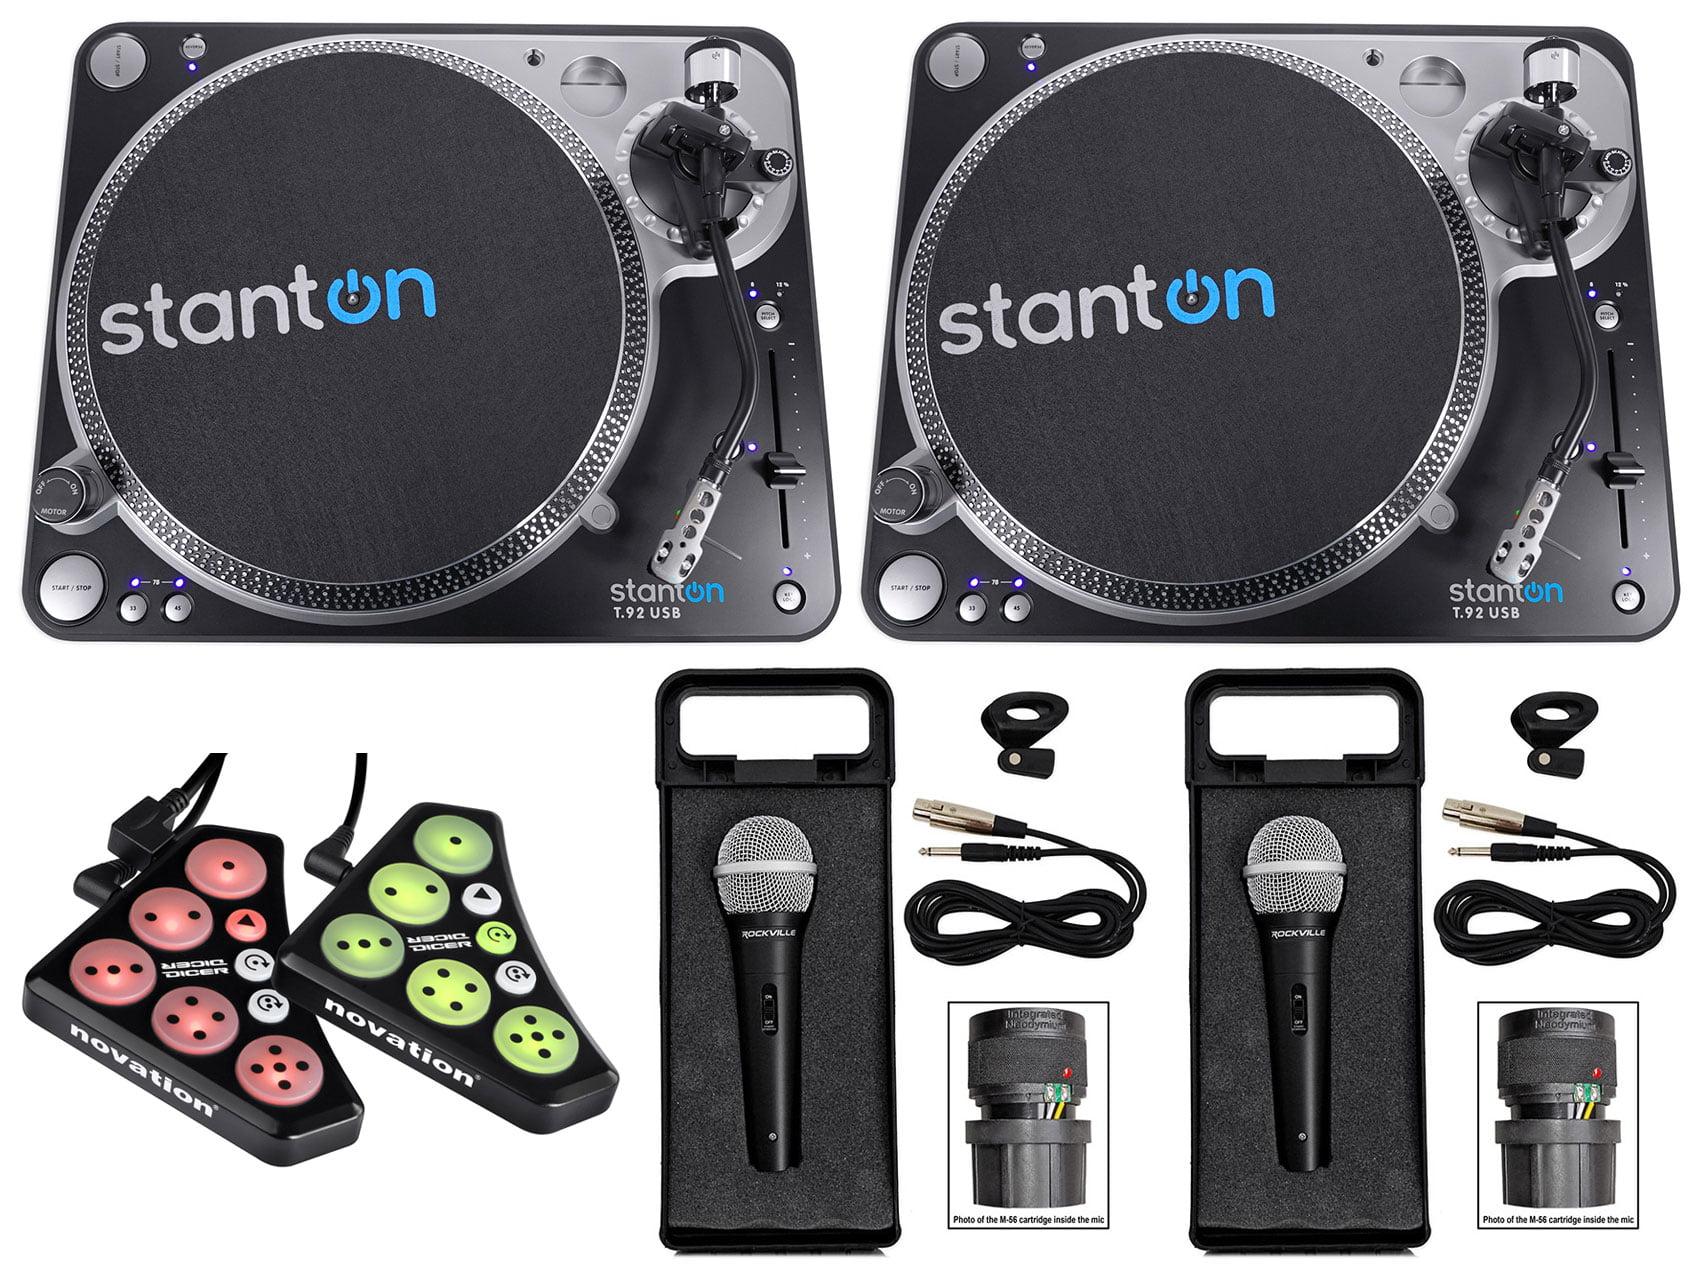 (2) Stanton T.92 M2 USB Direct-Drive S-arm USB DJ Turntables+Controller+(2) Mics by Stanton